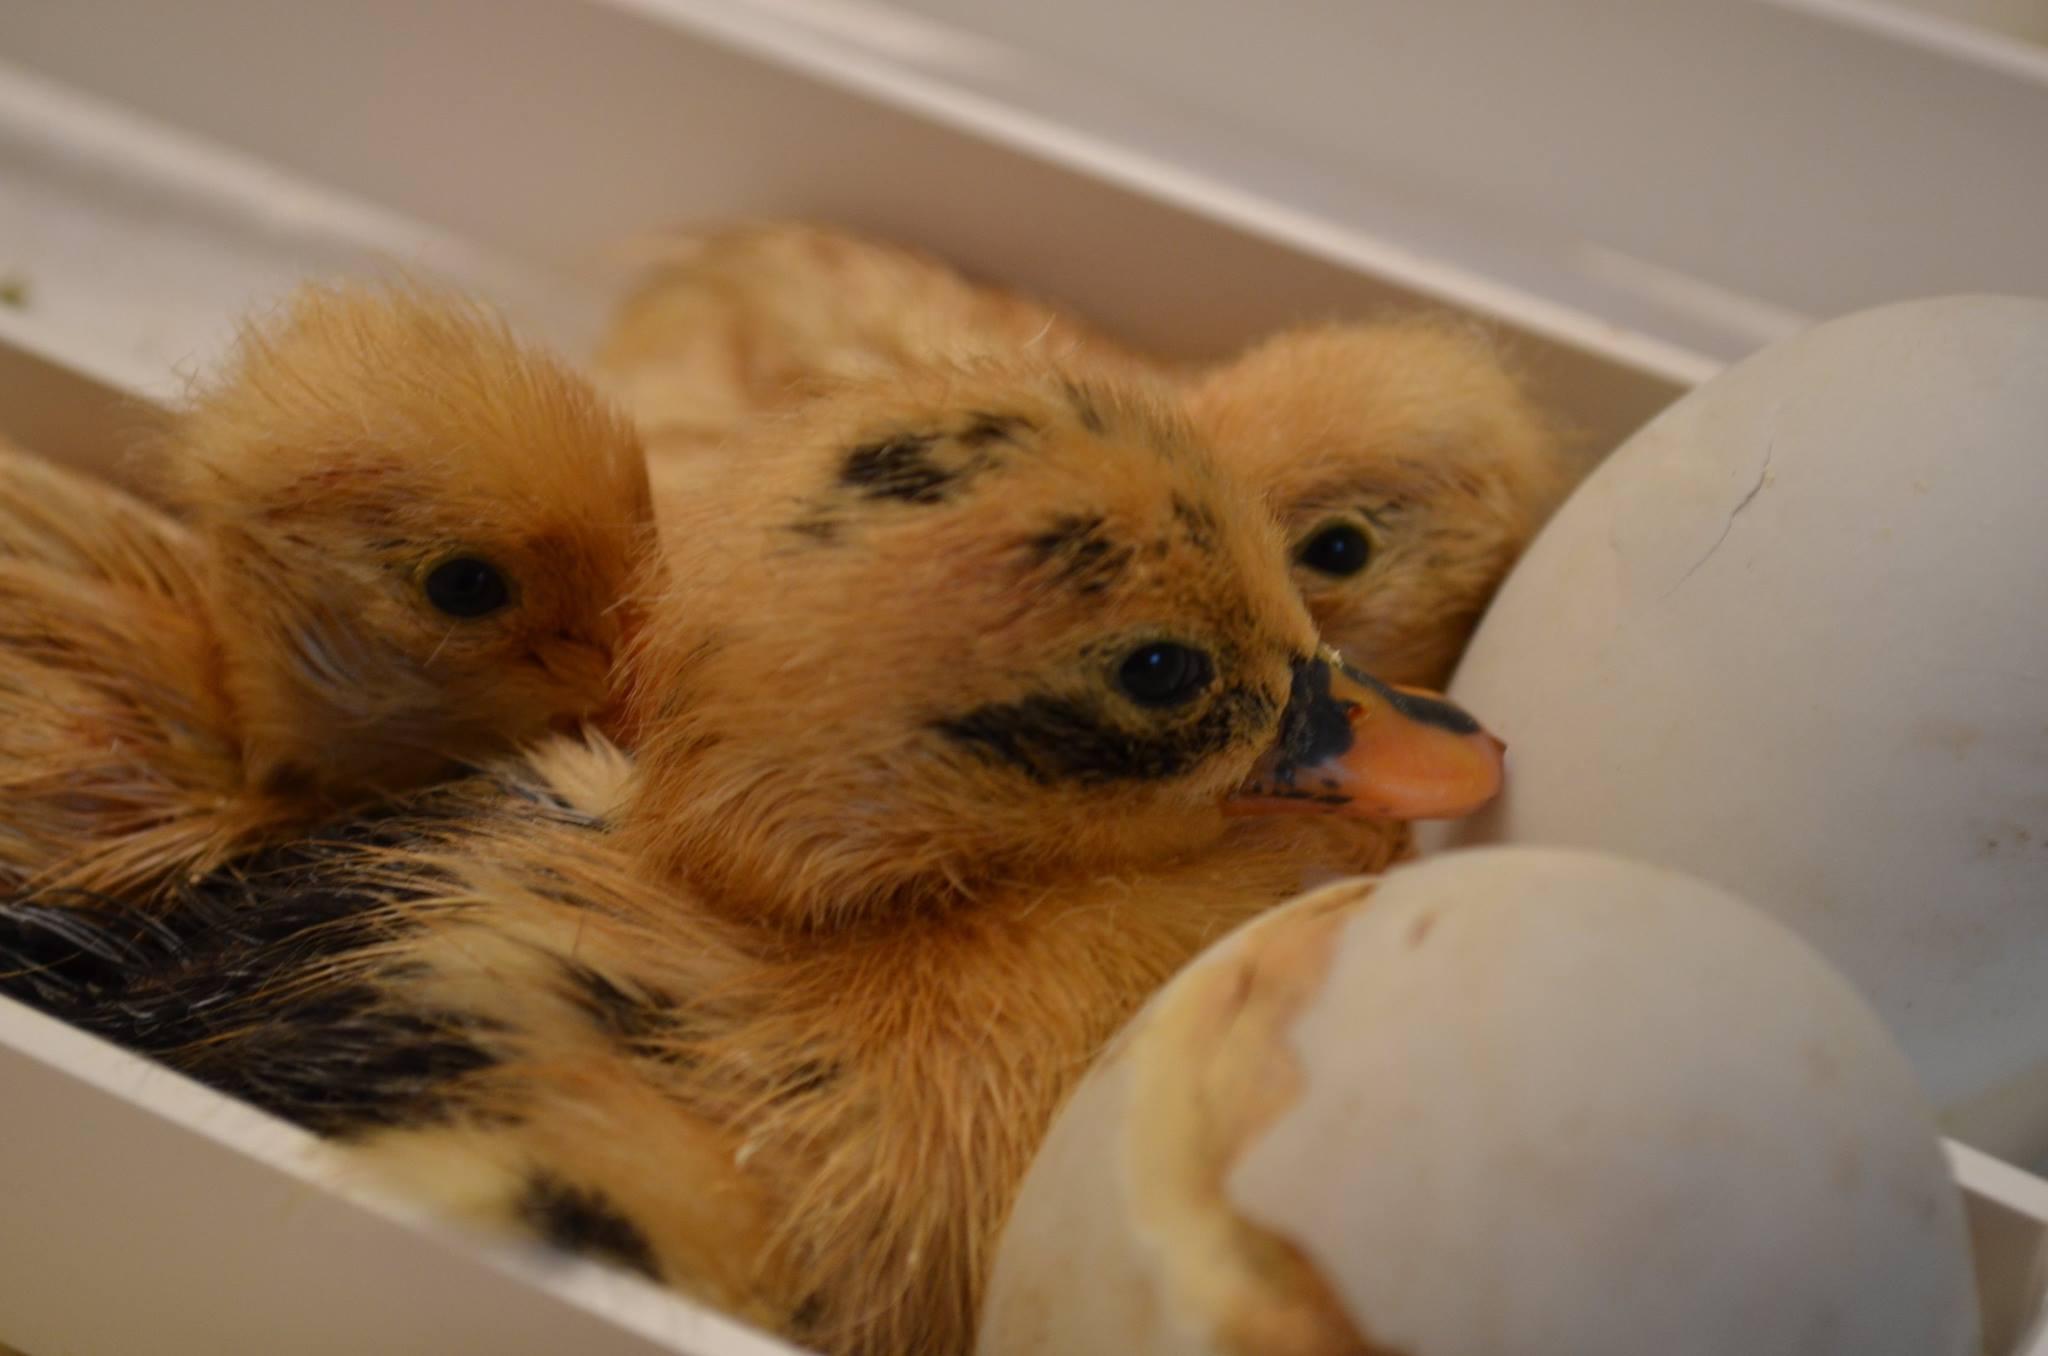 ducks hatch.jpg